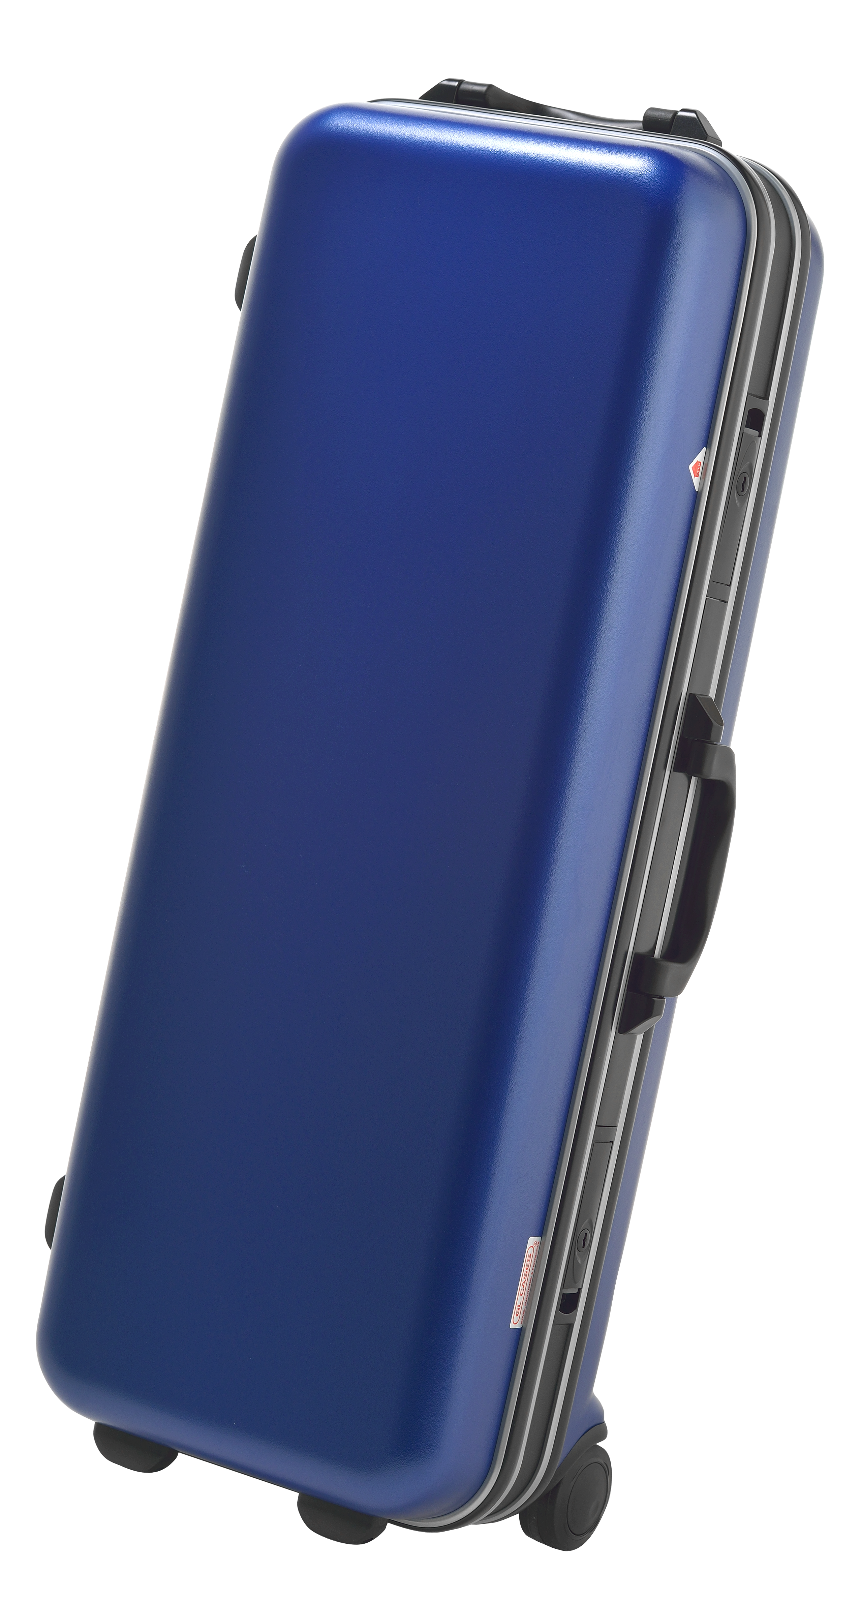 Trolley für Tenorsaxophon, Tenorsax Trolley, in blau